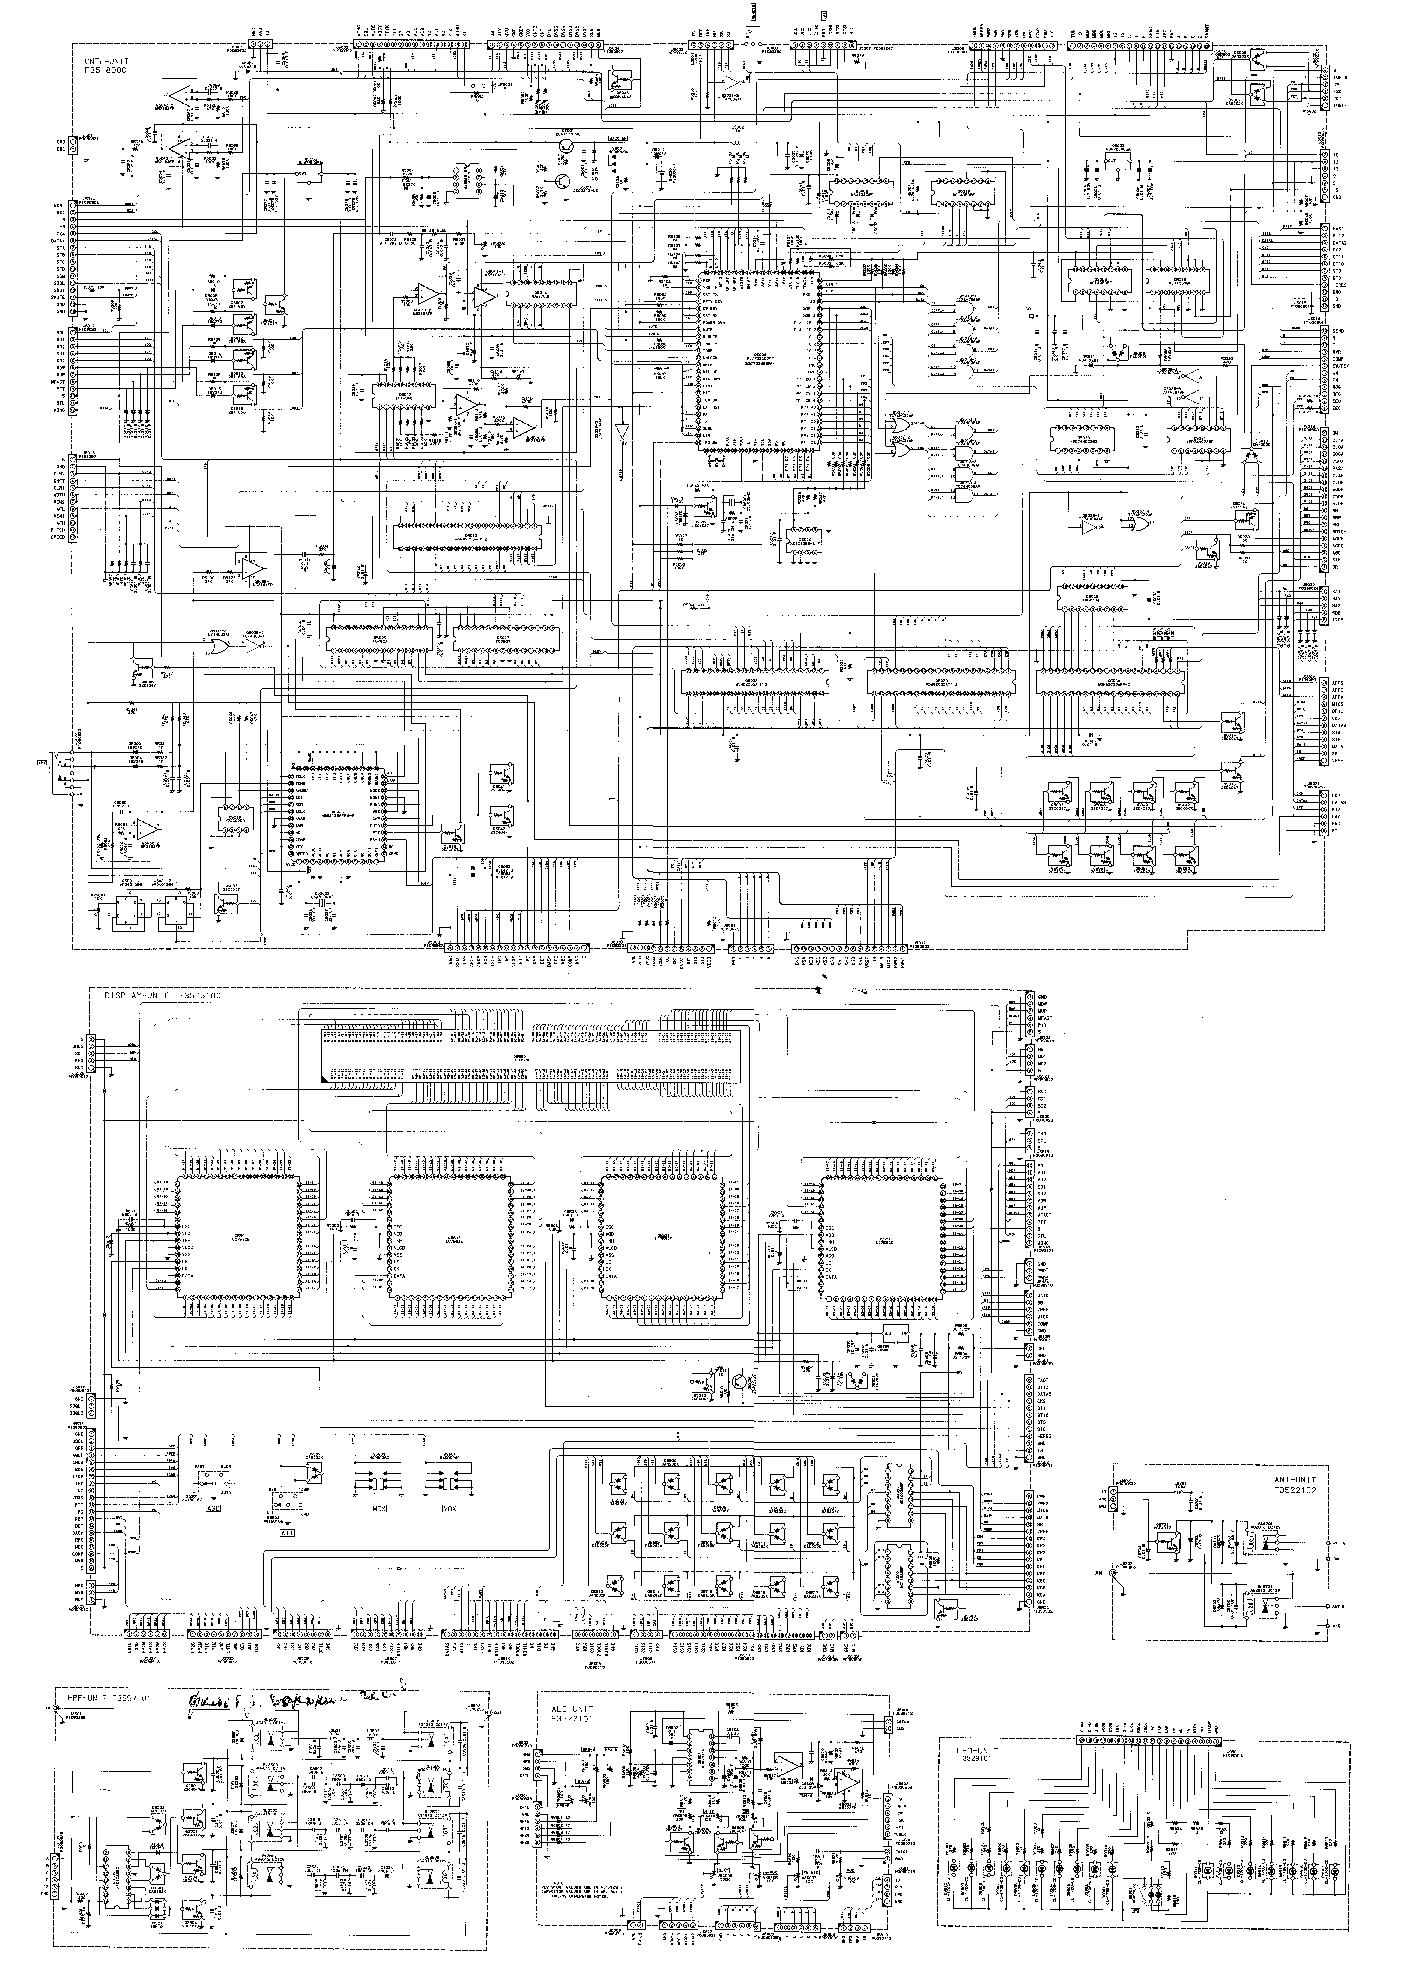 Yaesu Ft1000 Service Manual Download  Schematics  Eeprom